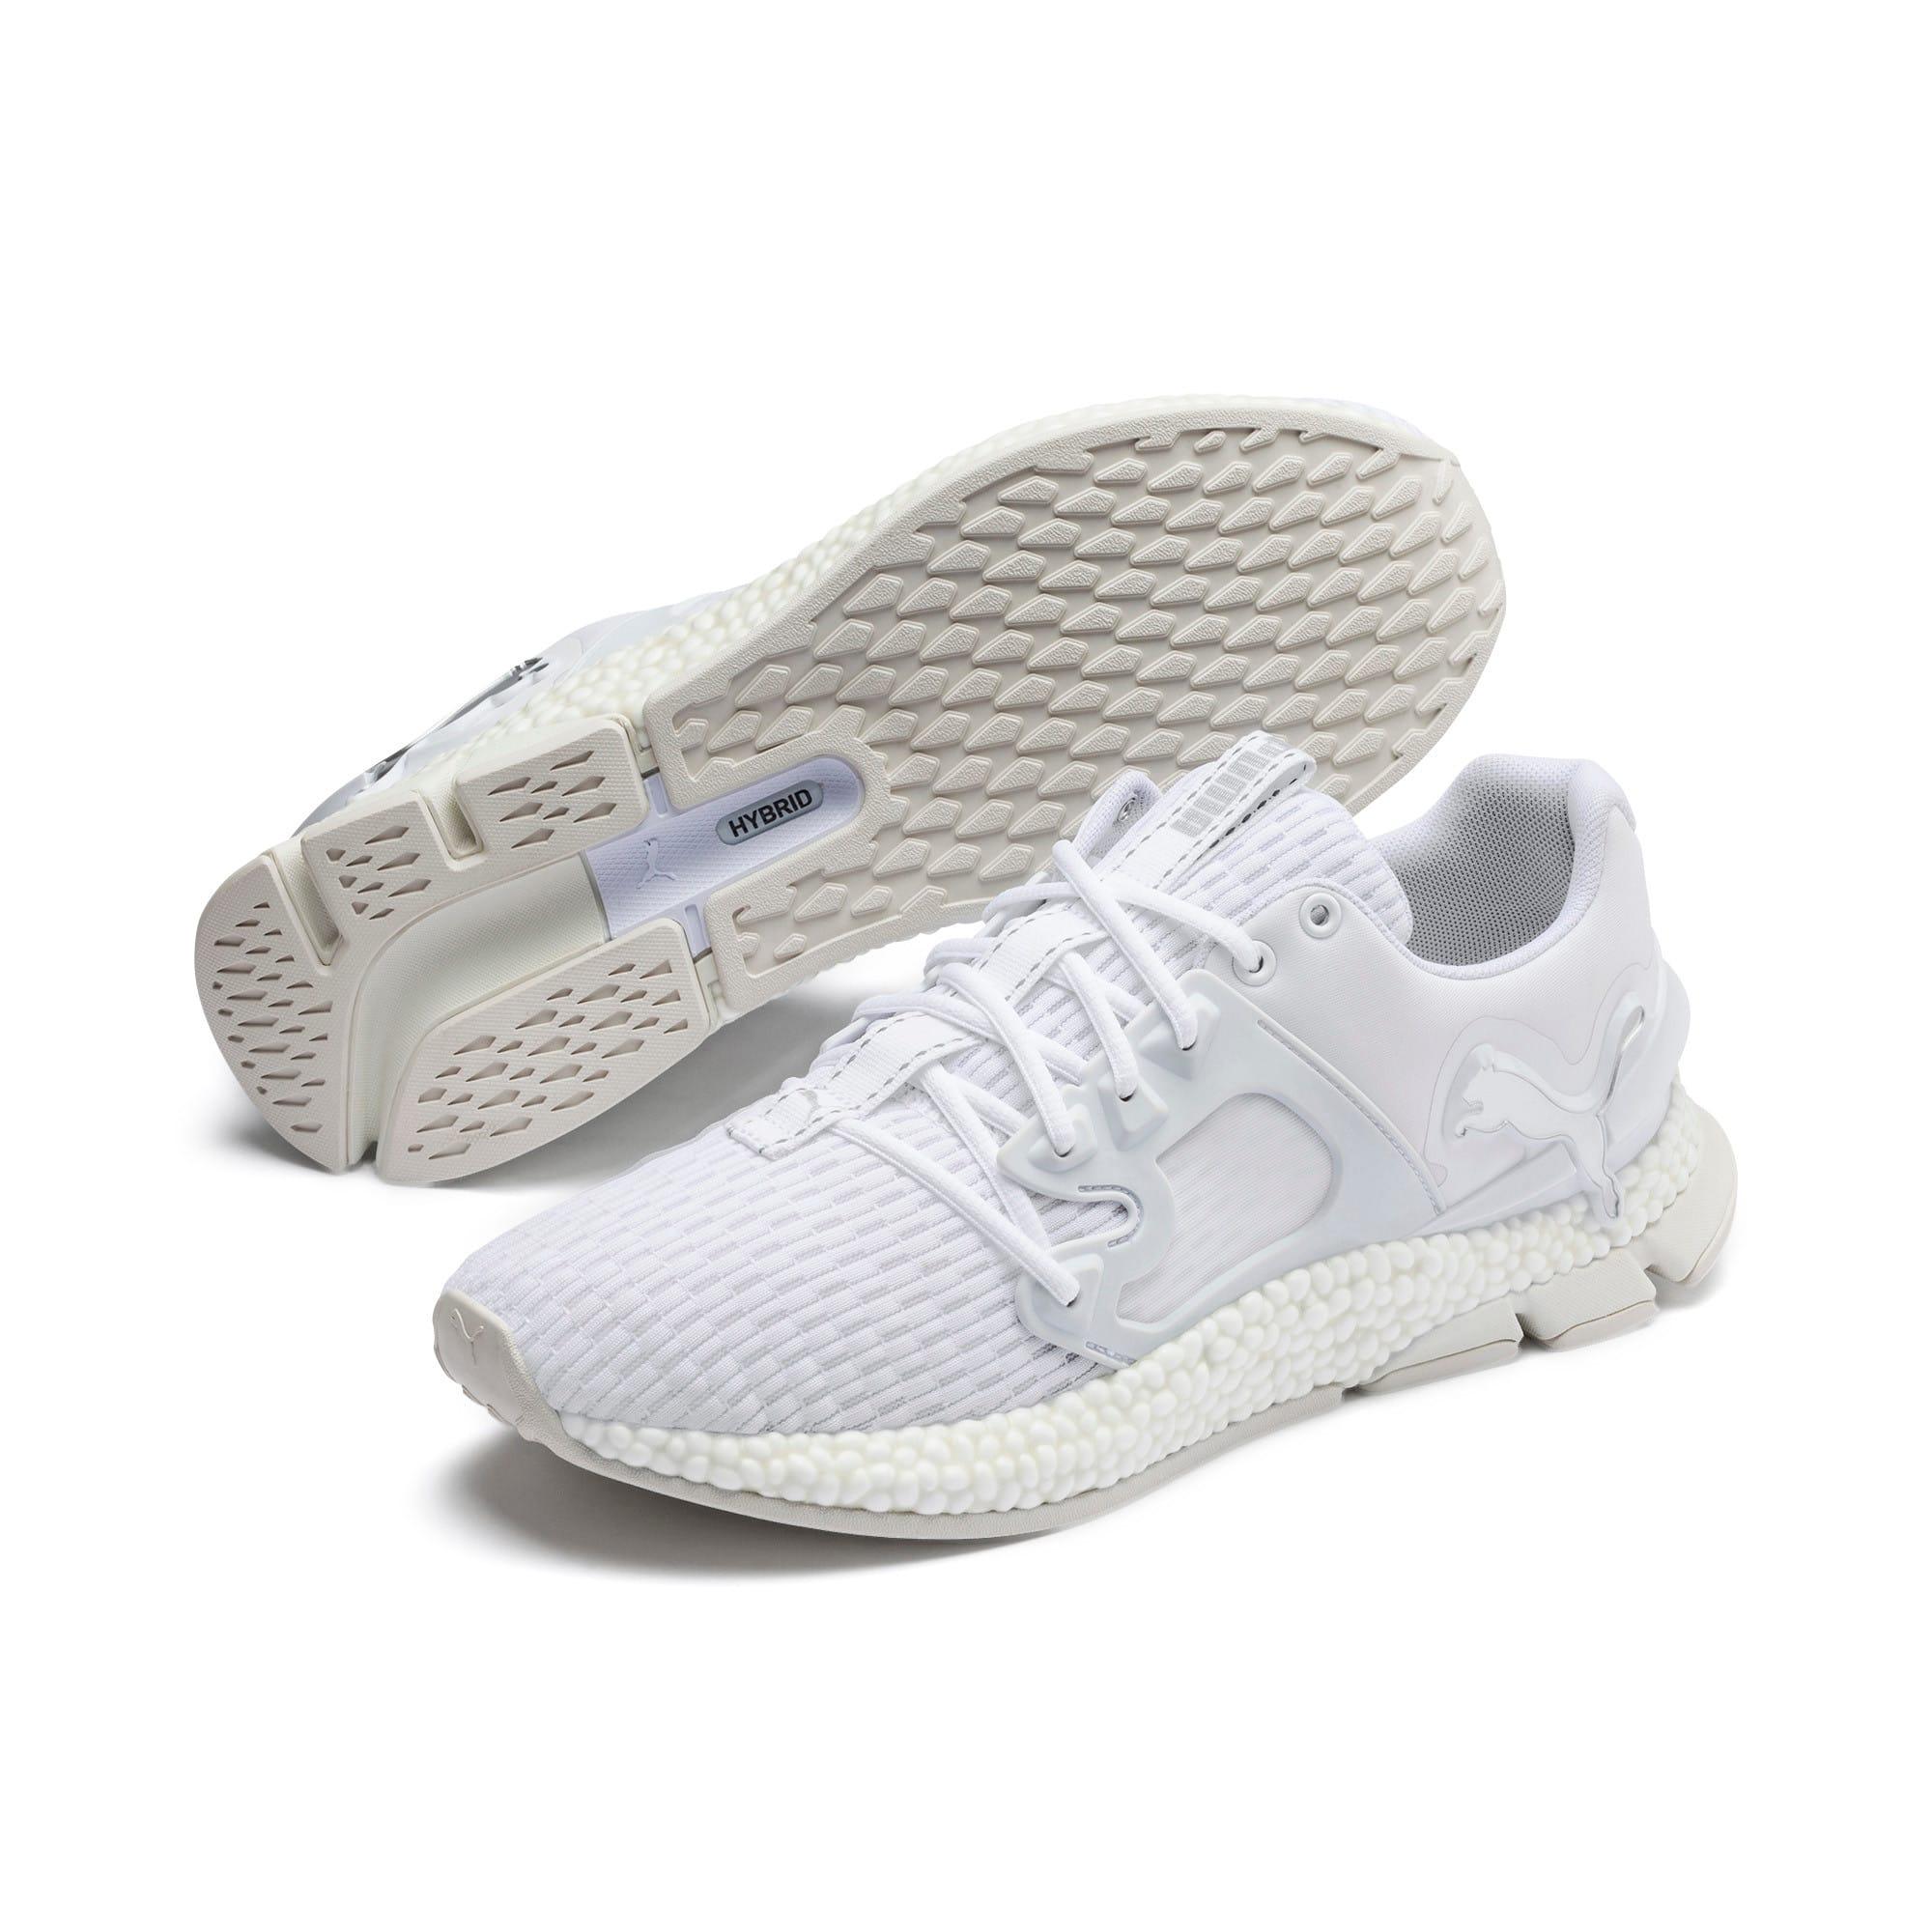 Thumbnail 3 of HYBRID Sky Lights Men's Running Shoes, Puma White-Puma Silver, medium